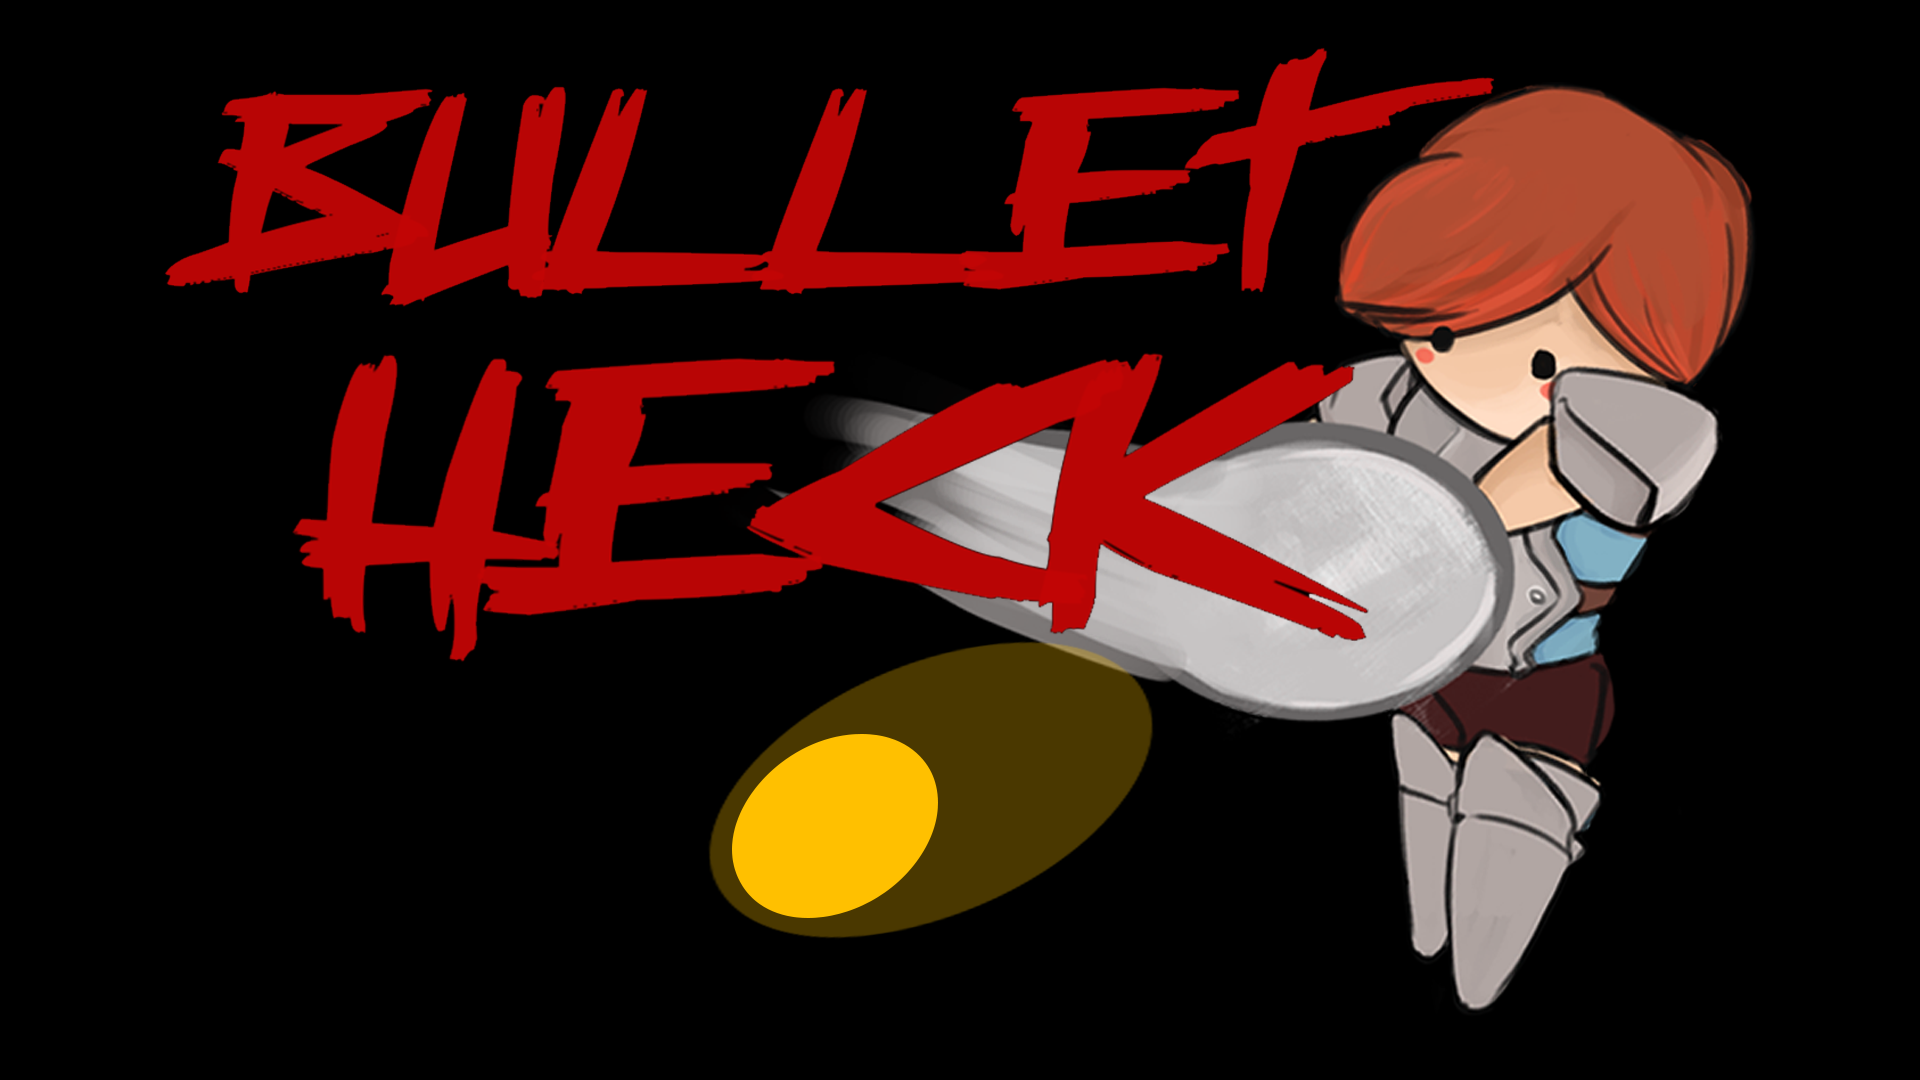 Bullet Heck